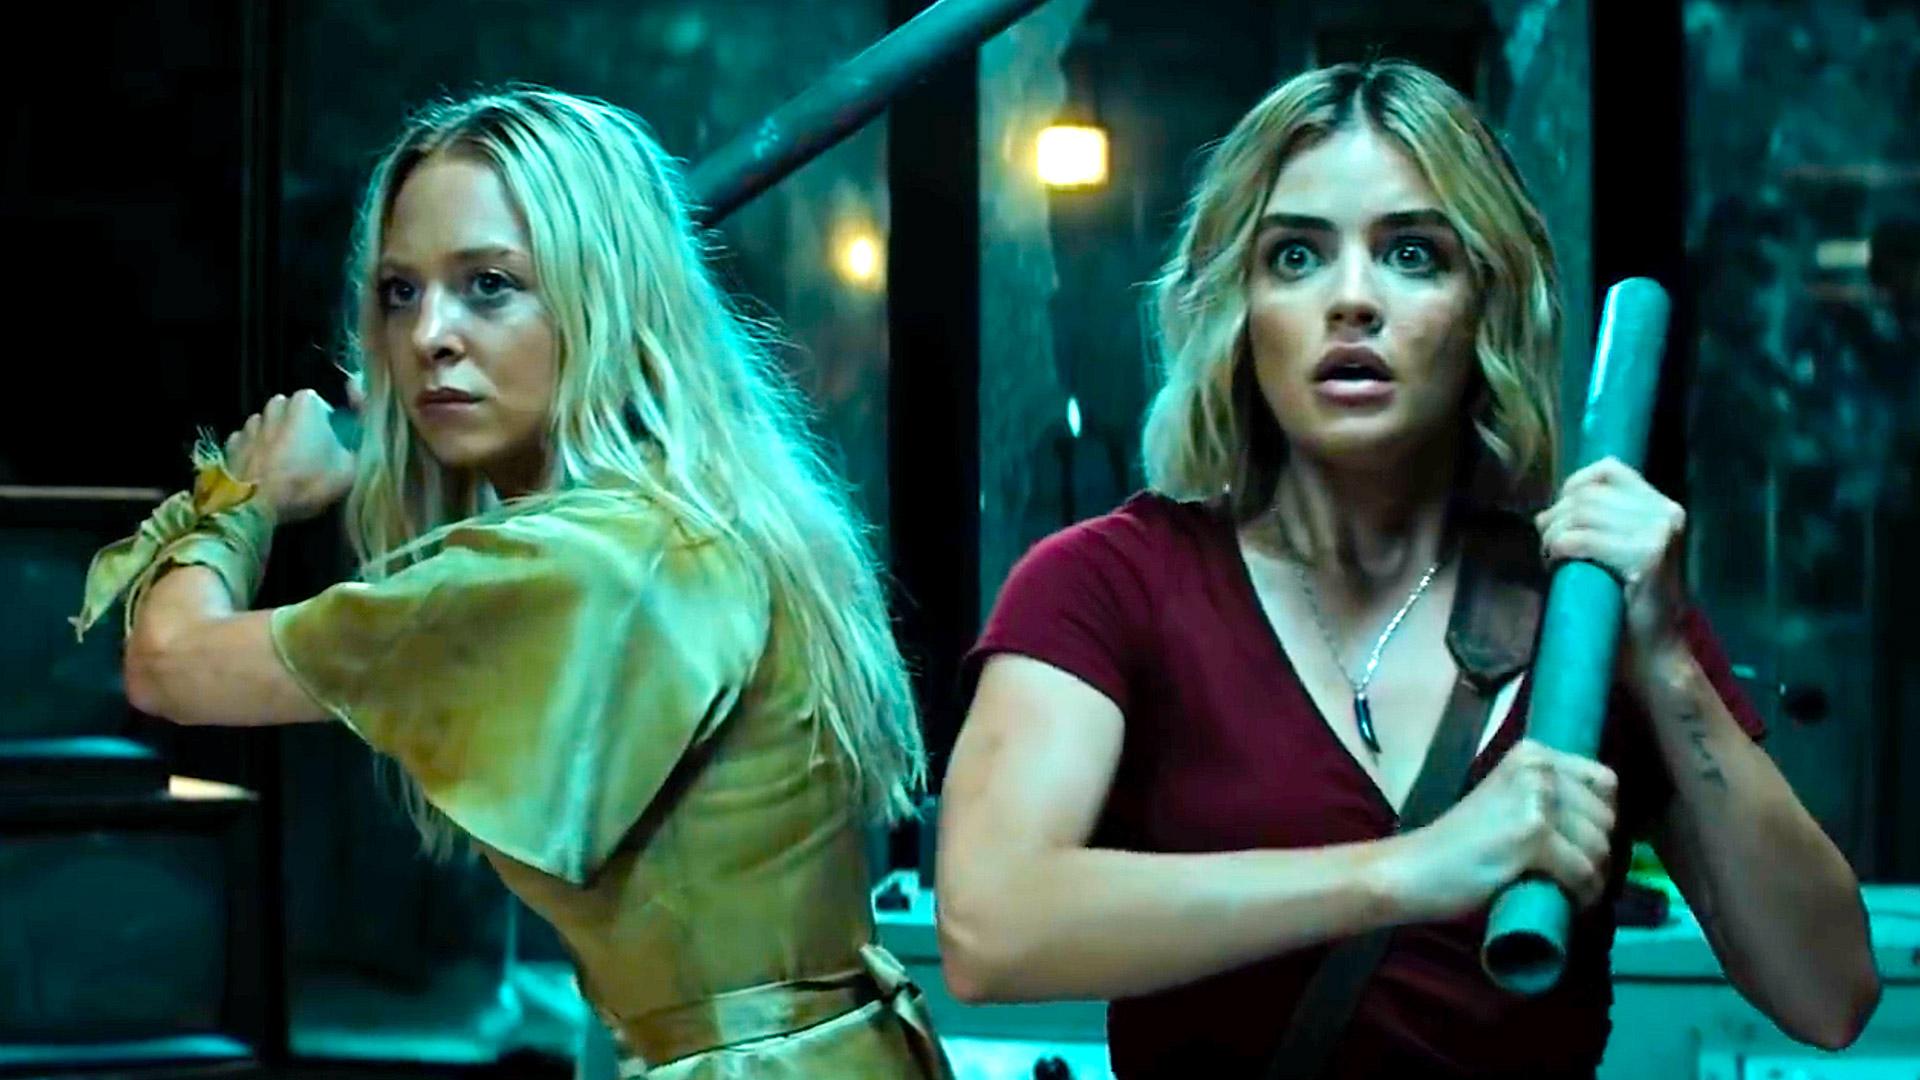 El reboot Fantasy Island de Blumhouse Pictures revela tráiler final